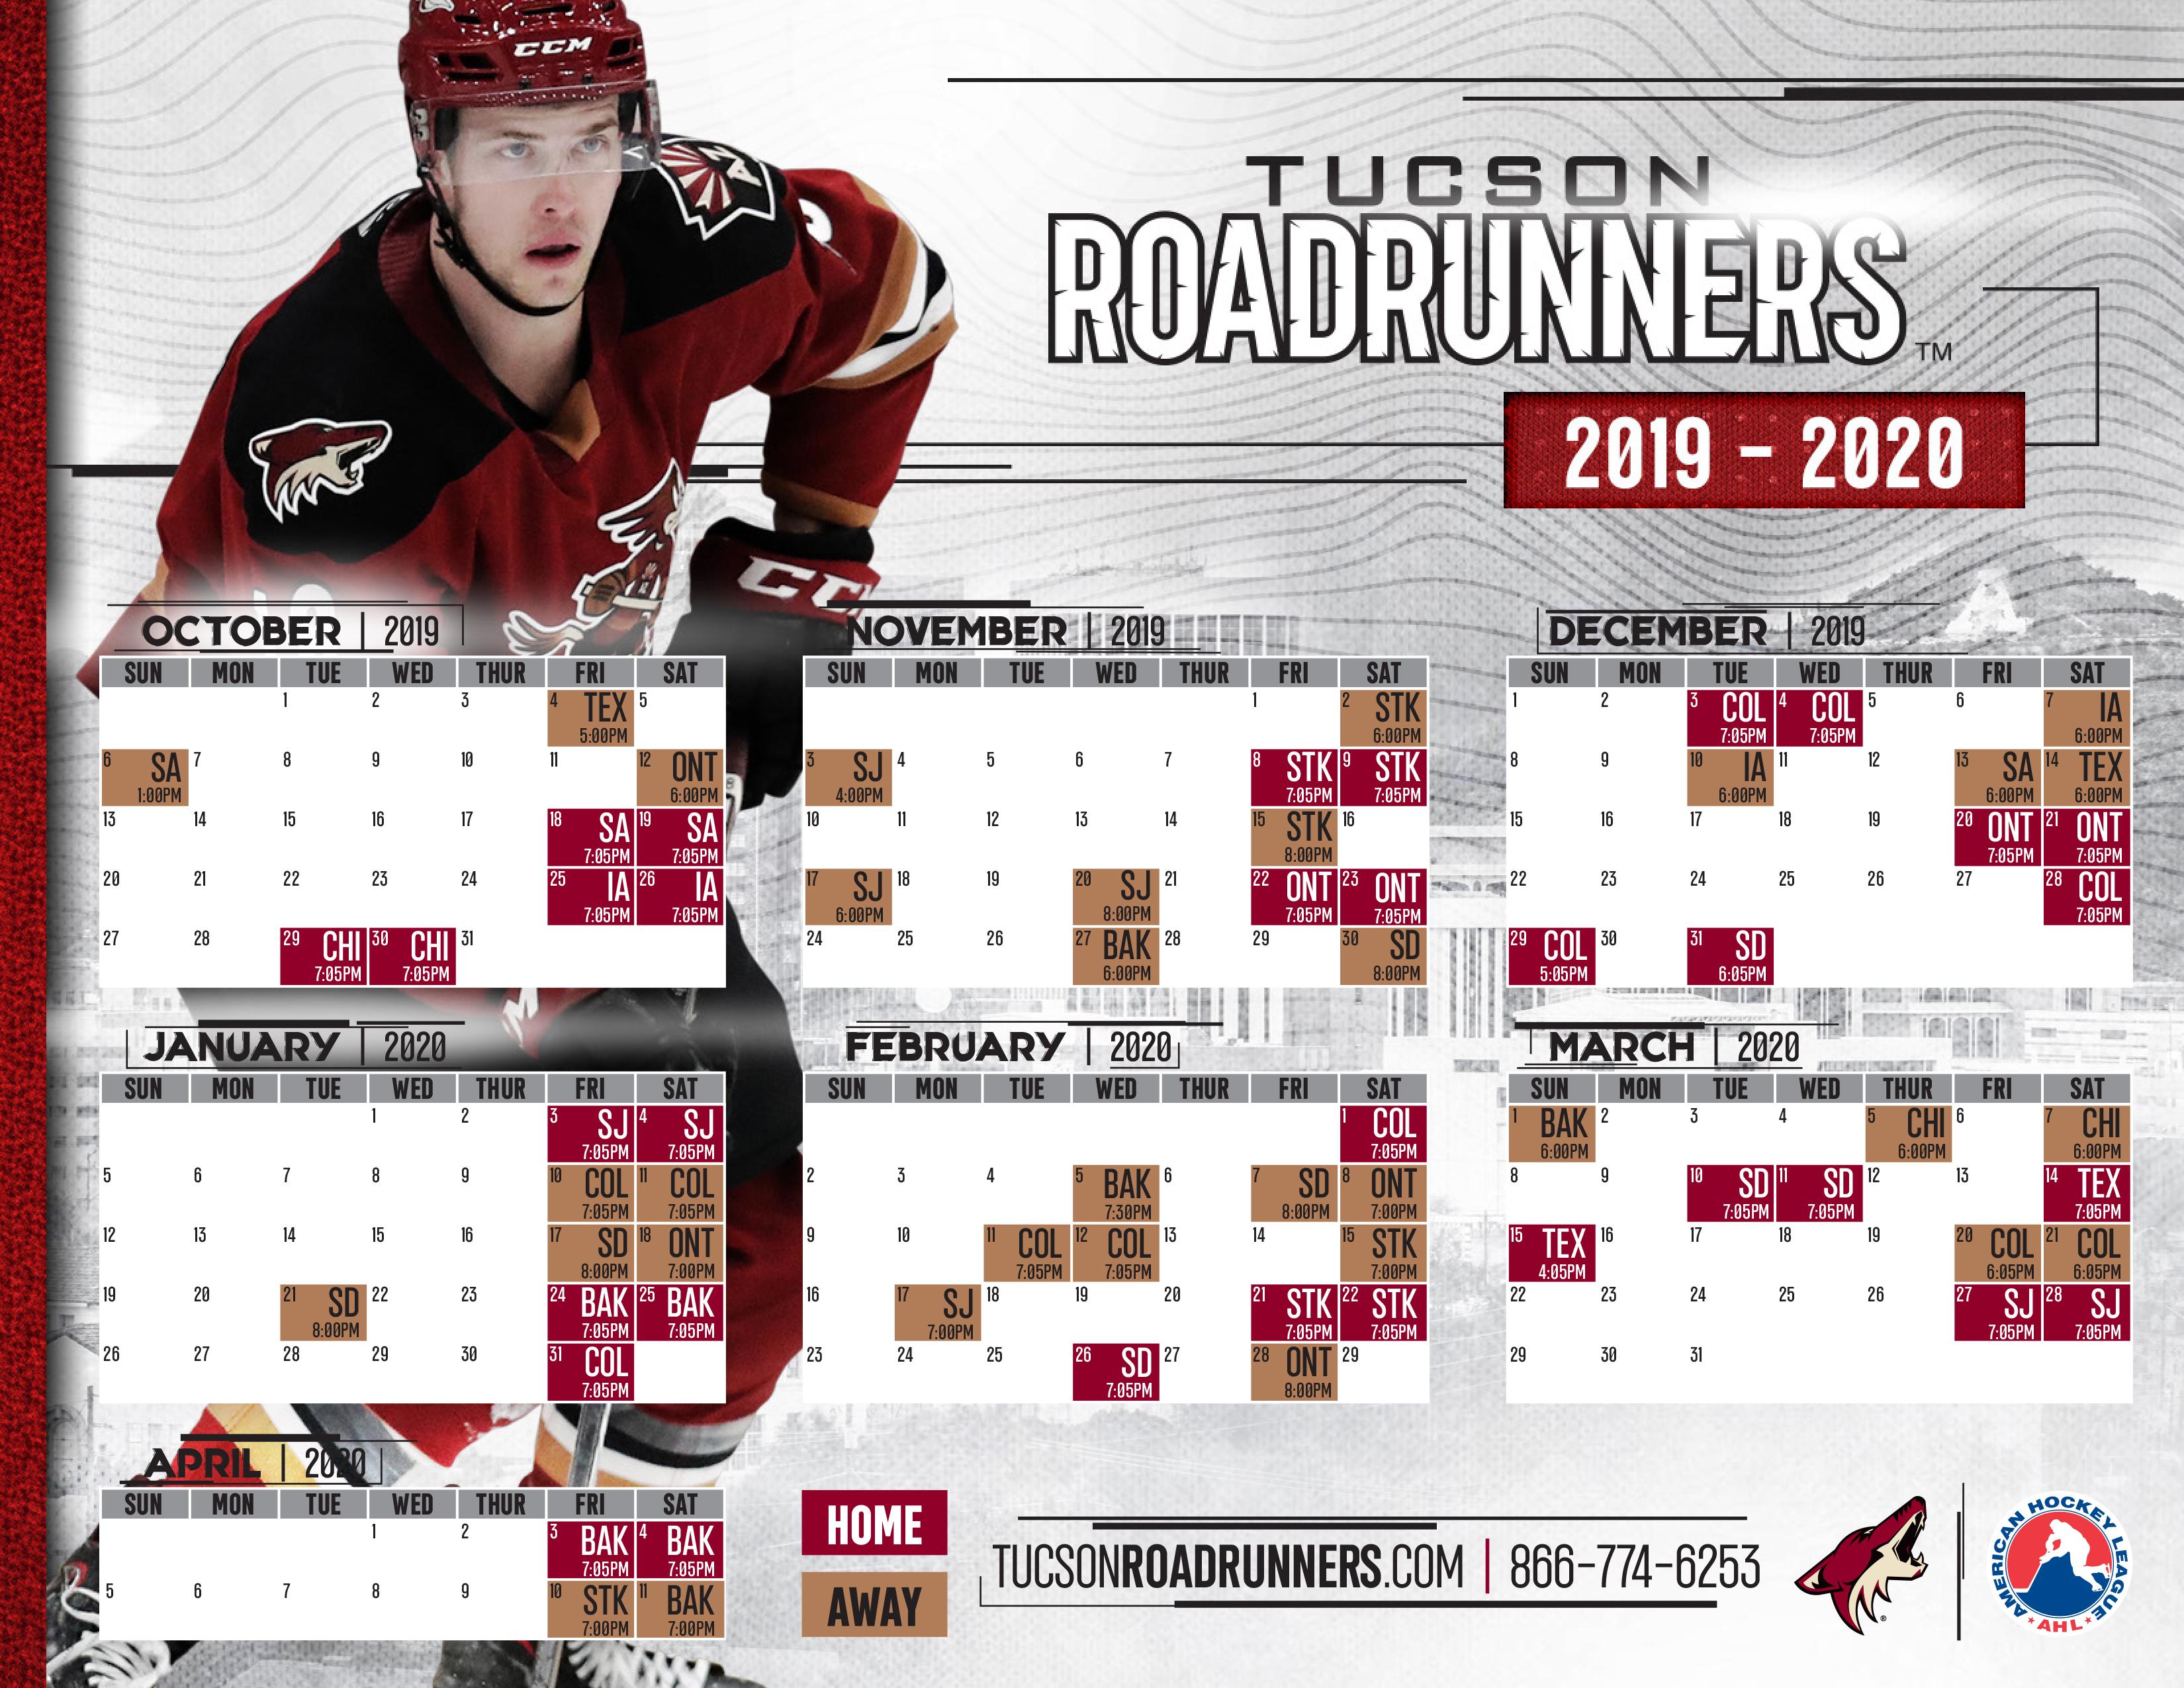 February 2020 Calendar For Green Valley,Az The Official Website of the Tucson Roadrunners: Hockey News